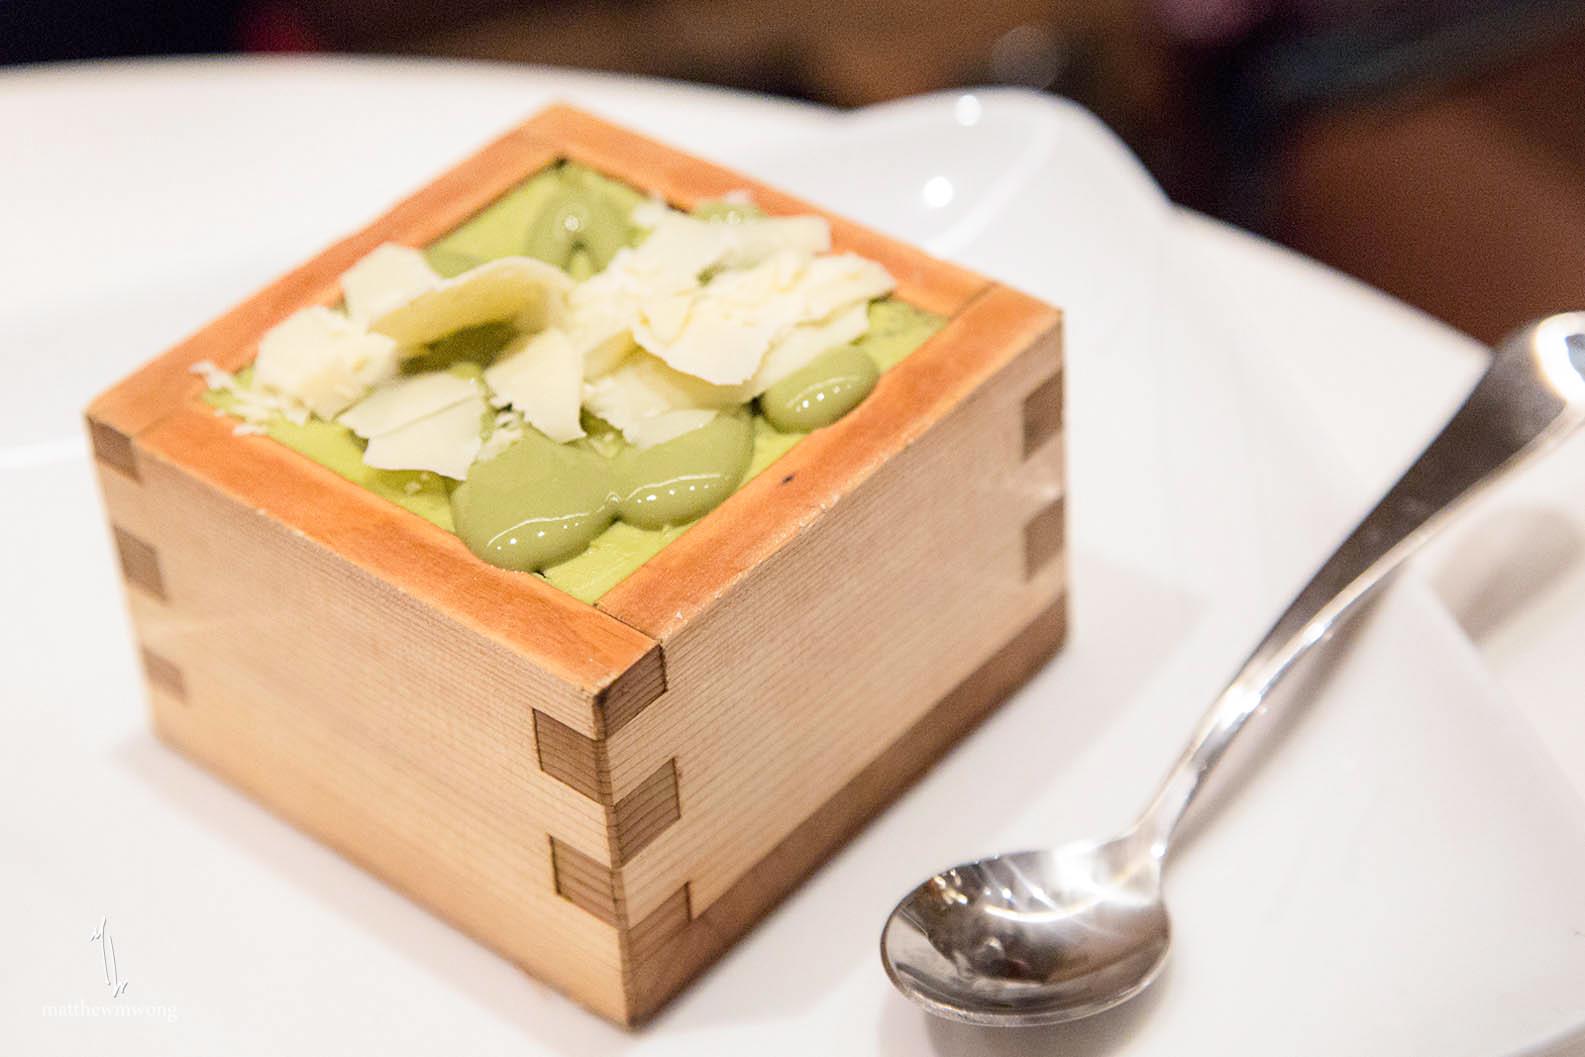 Green Tearamisu - Green tea mascarpone cream, green tea soaked ladyfingers, shaved white chocolate, matcha powder dust